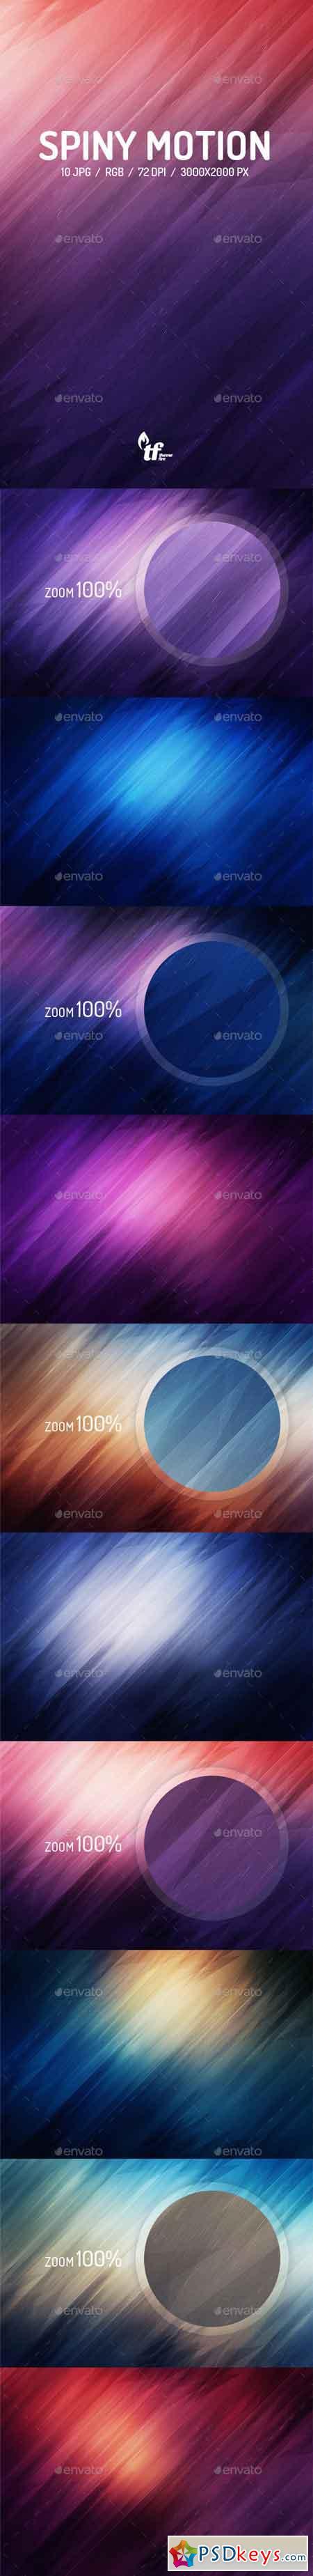 Spiny Motion Background 8794473